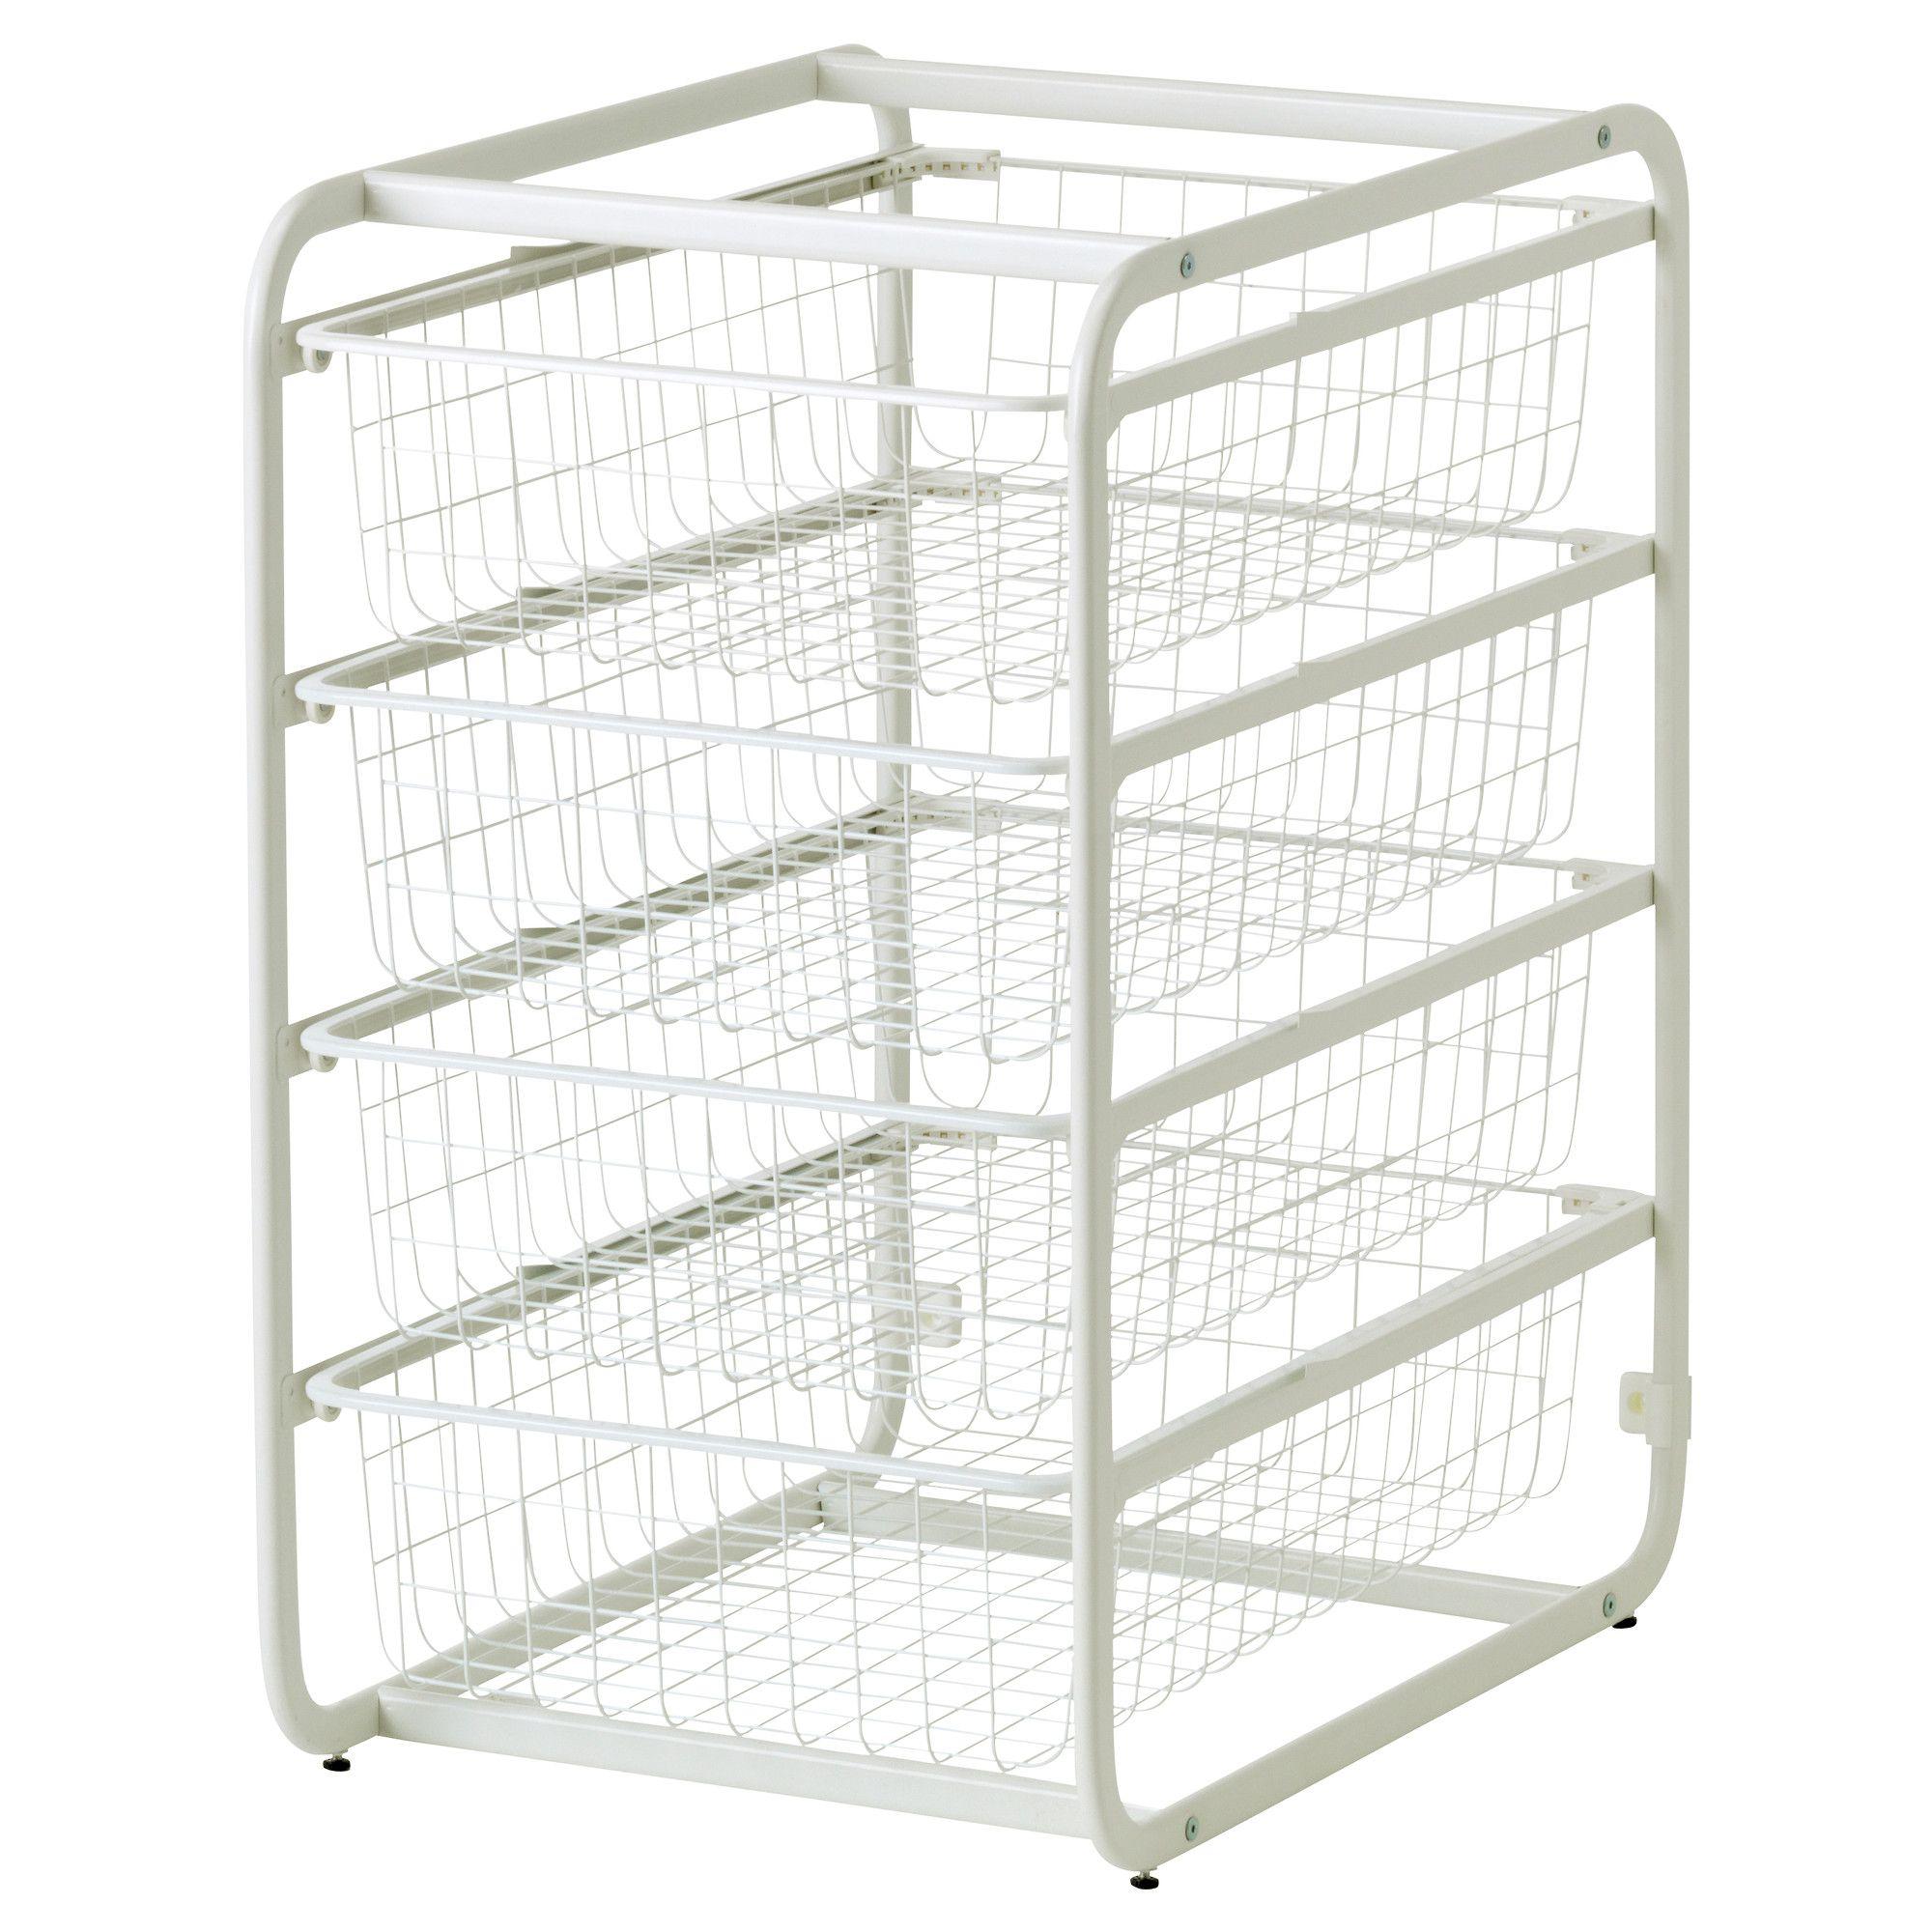 Ikea Us Furniture And Home Furnishings Ikea Algot Wire Baskets Ikea